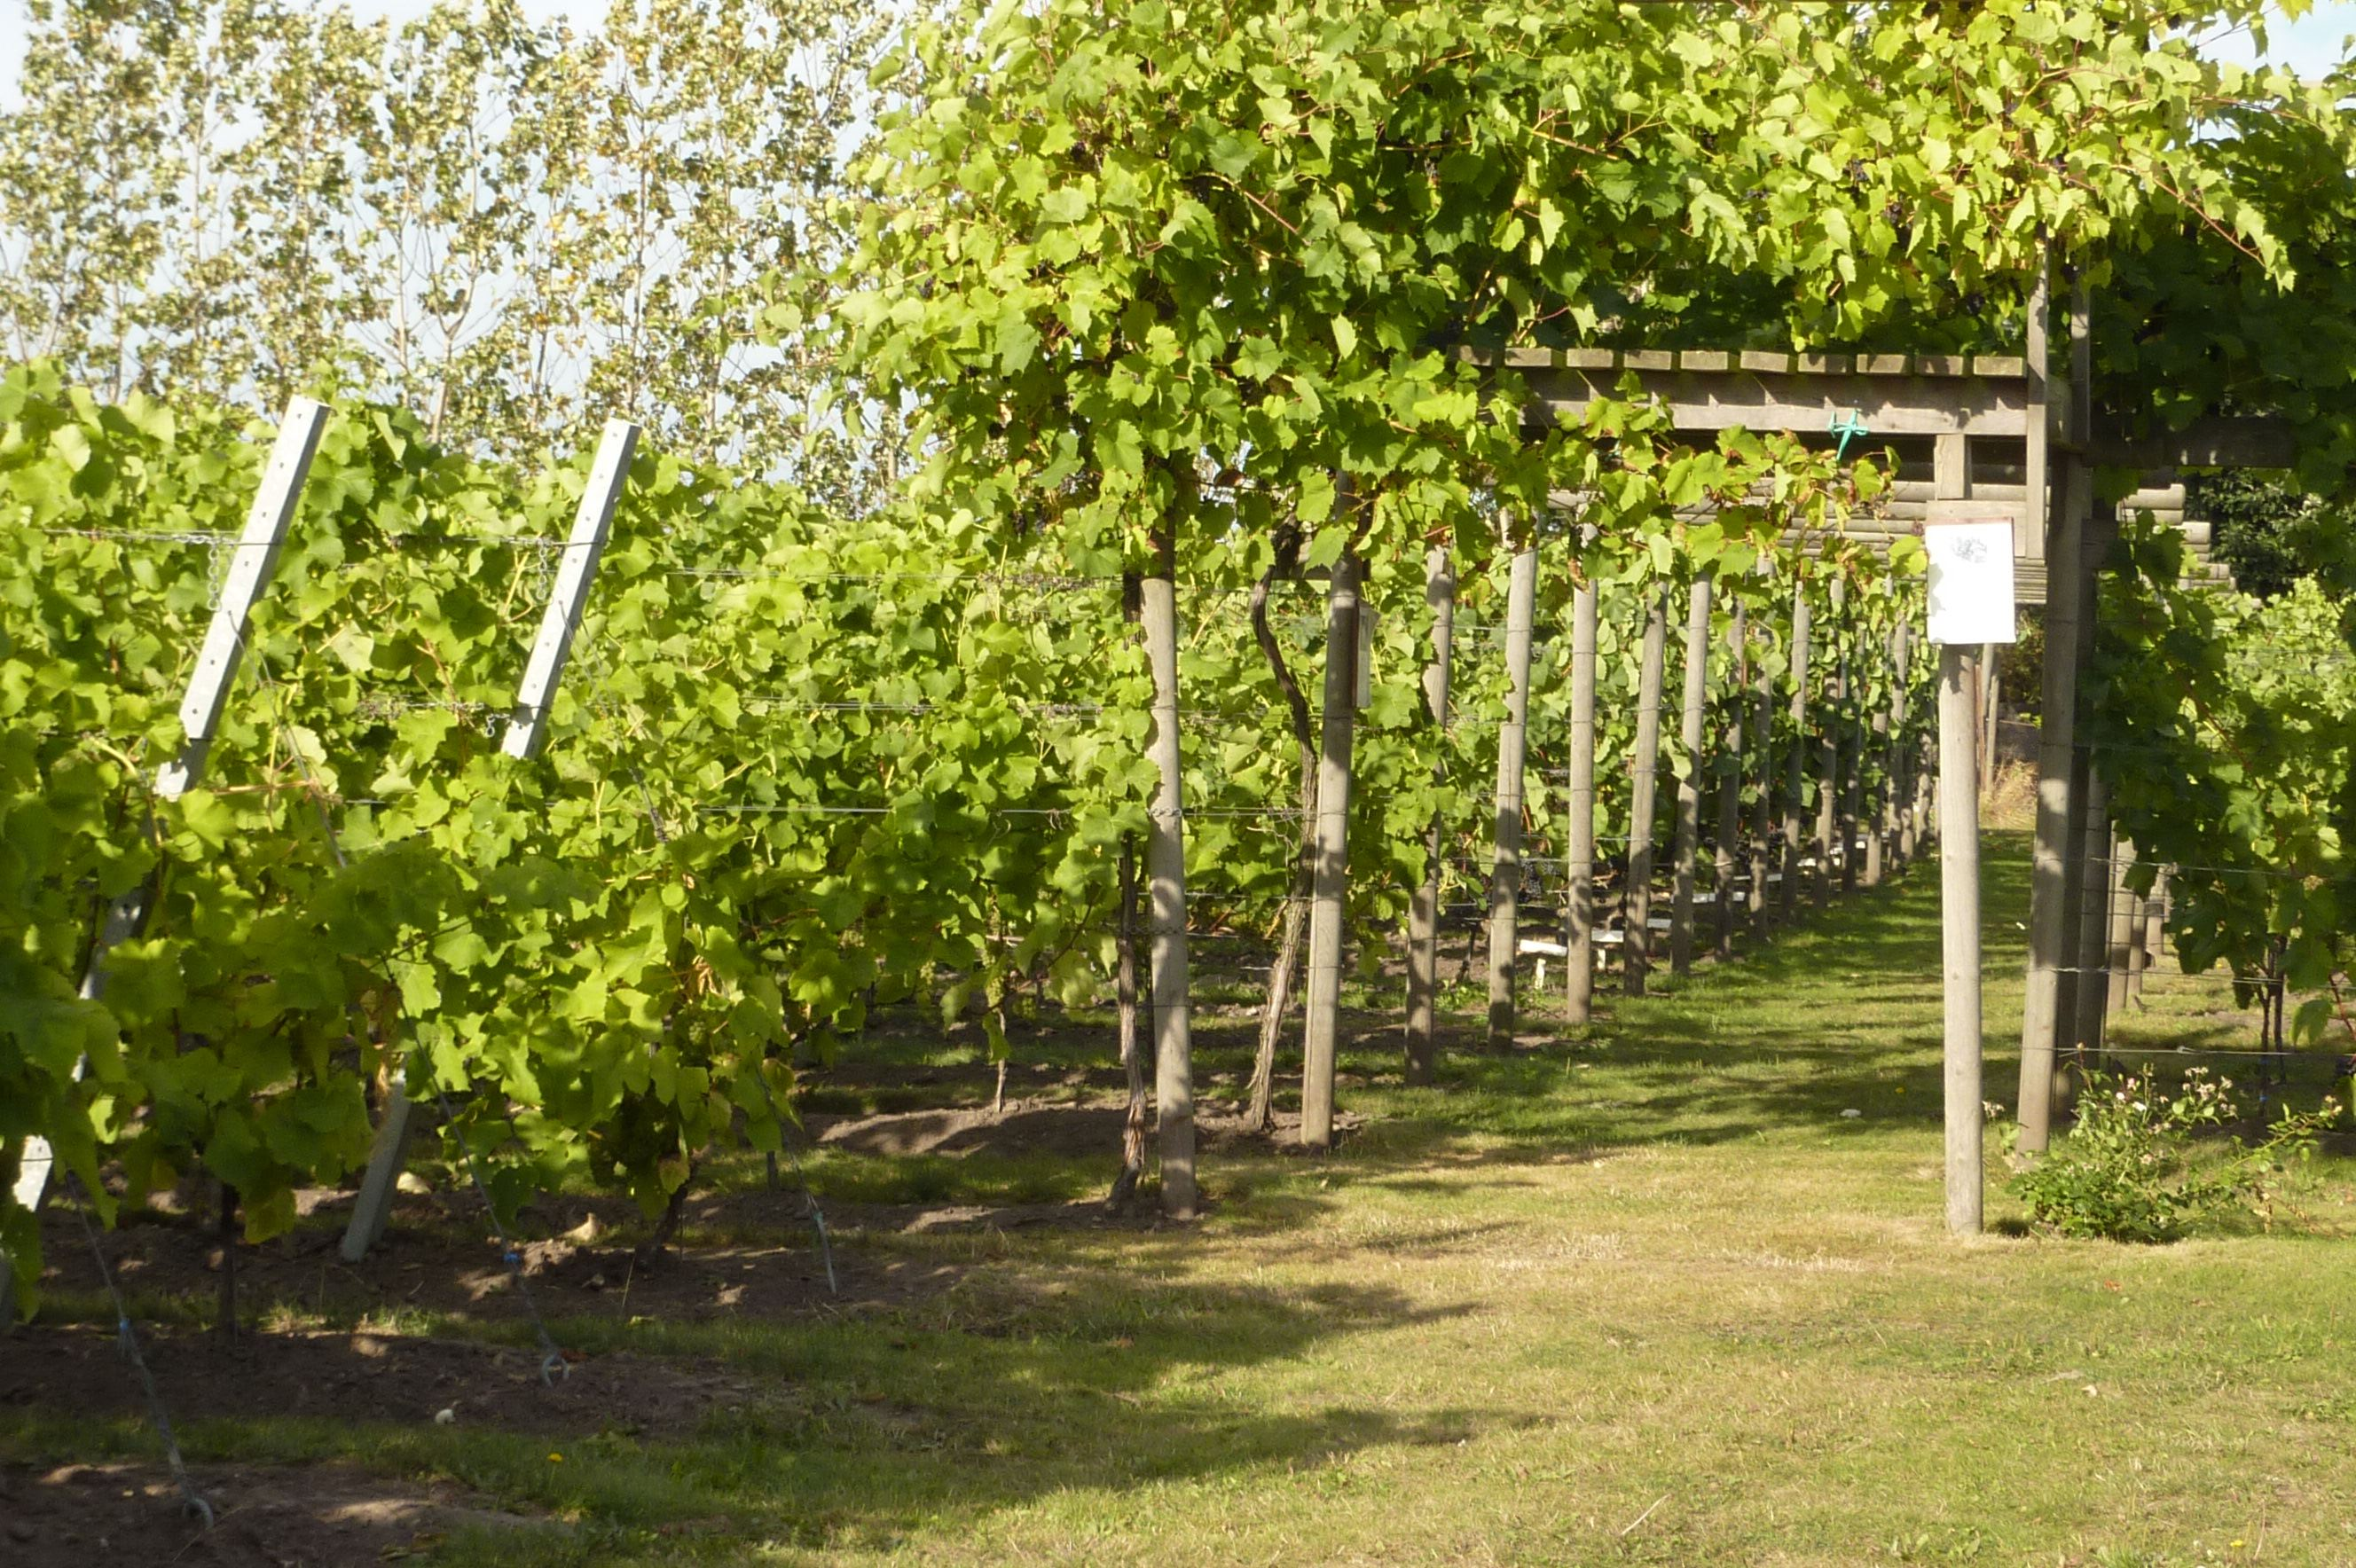 Wineyard in Klagshamn